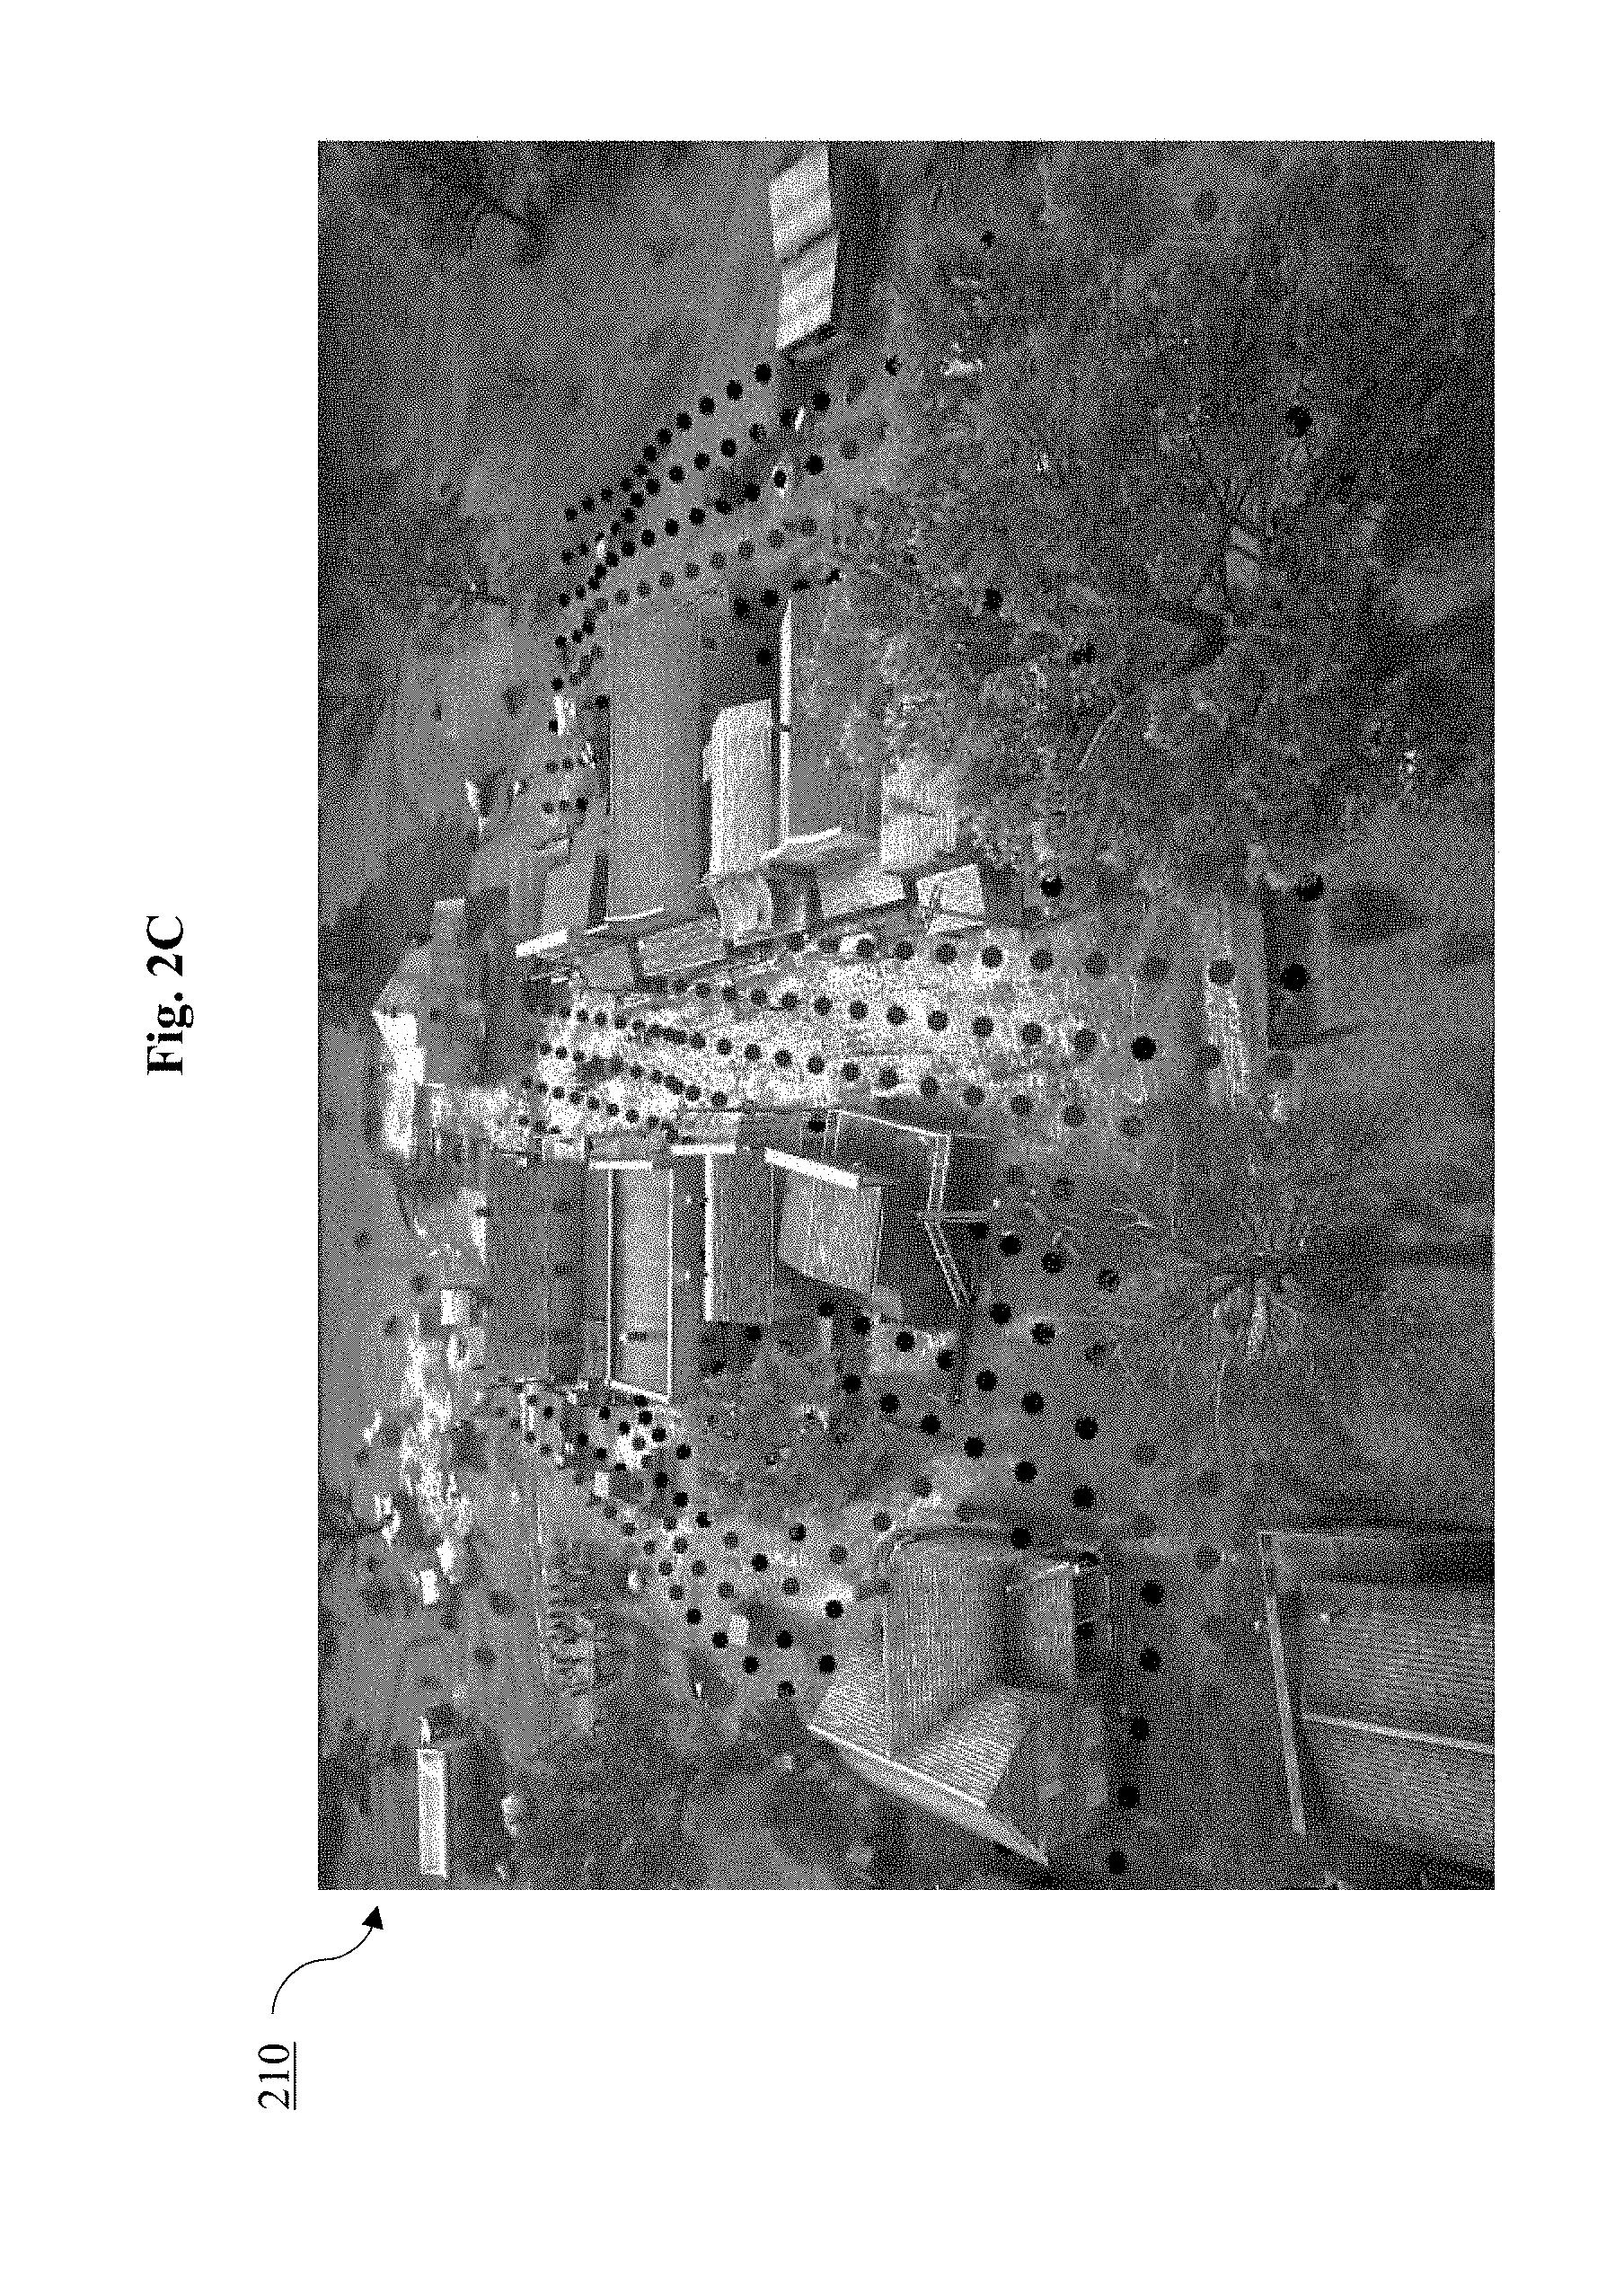 US20190299097A1-20191003-D00005.png